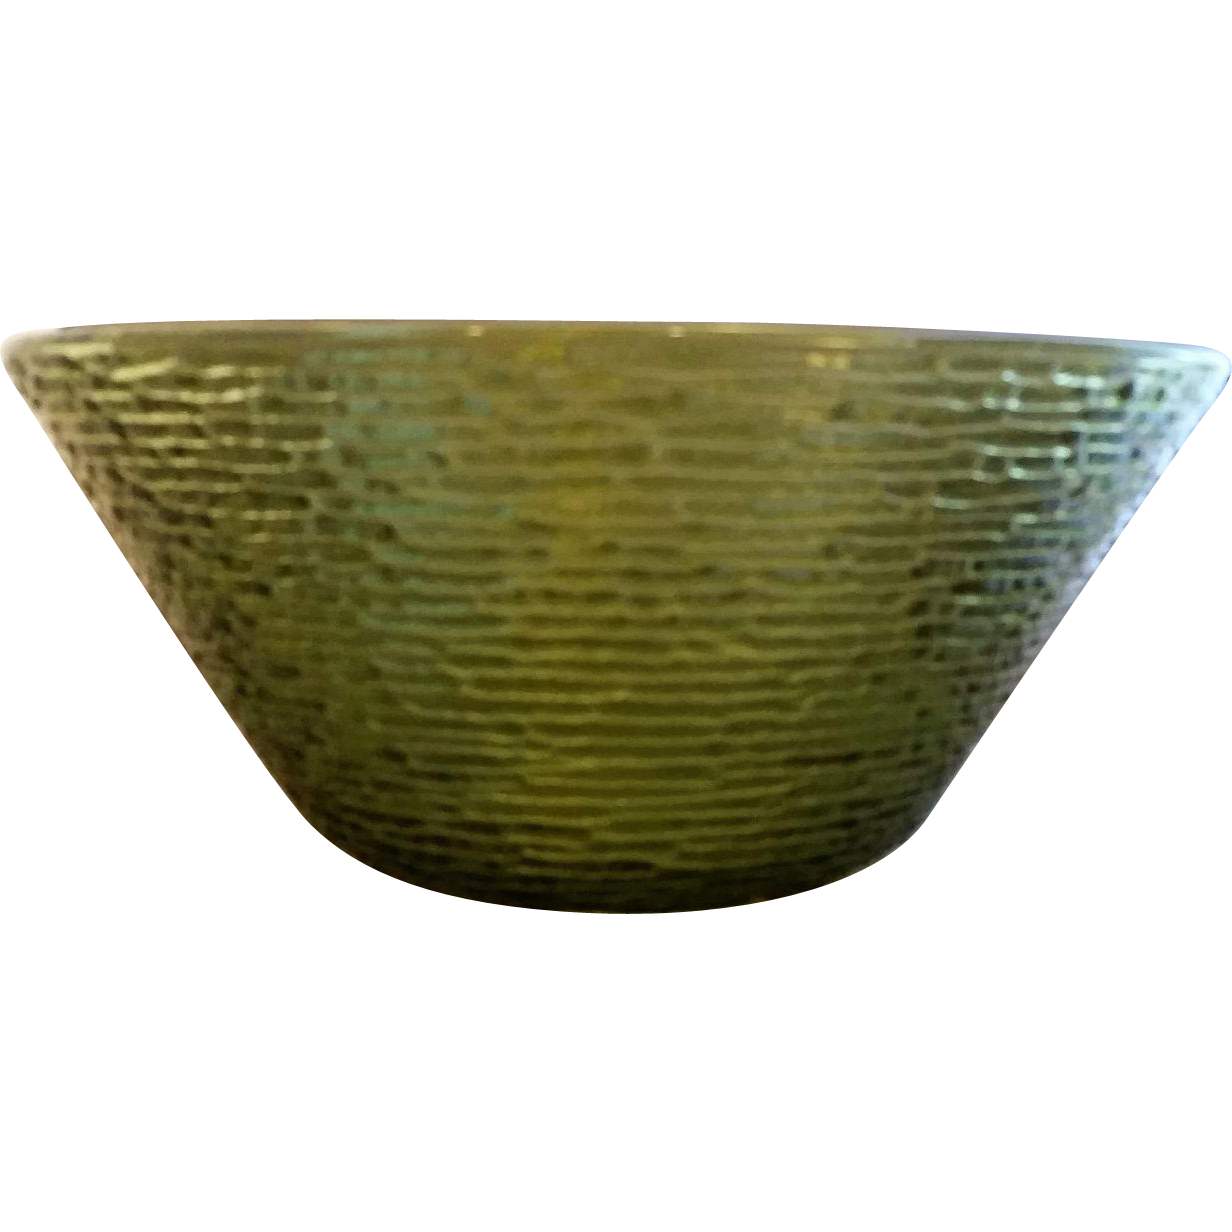 Anchor Hocking Soreno Avocado Green Large Salad Serving Bowl